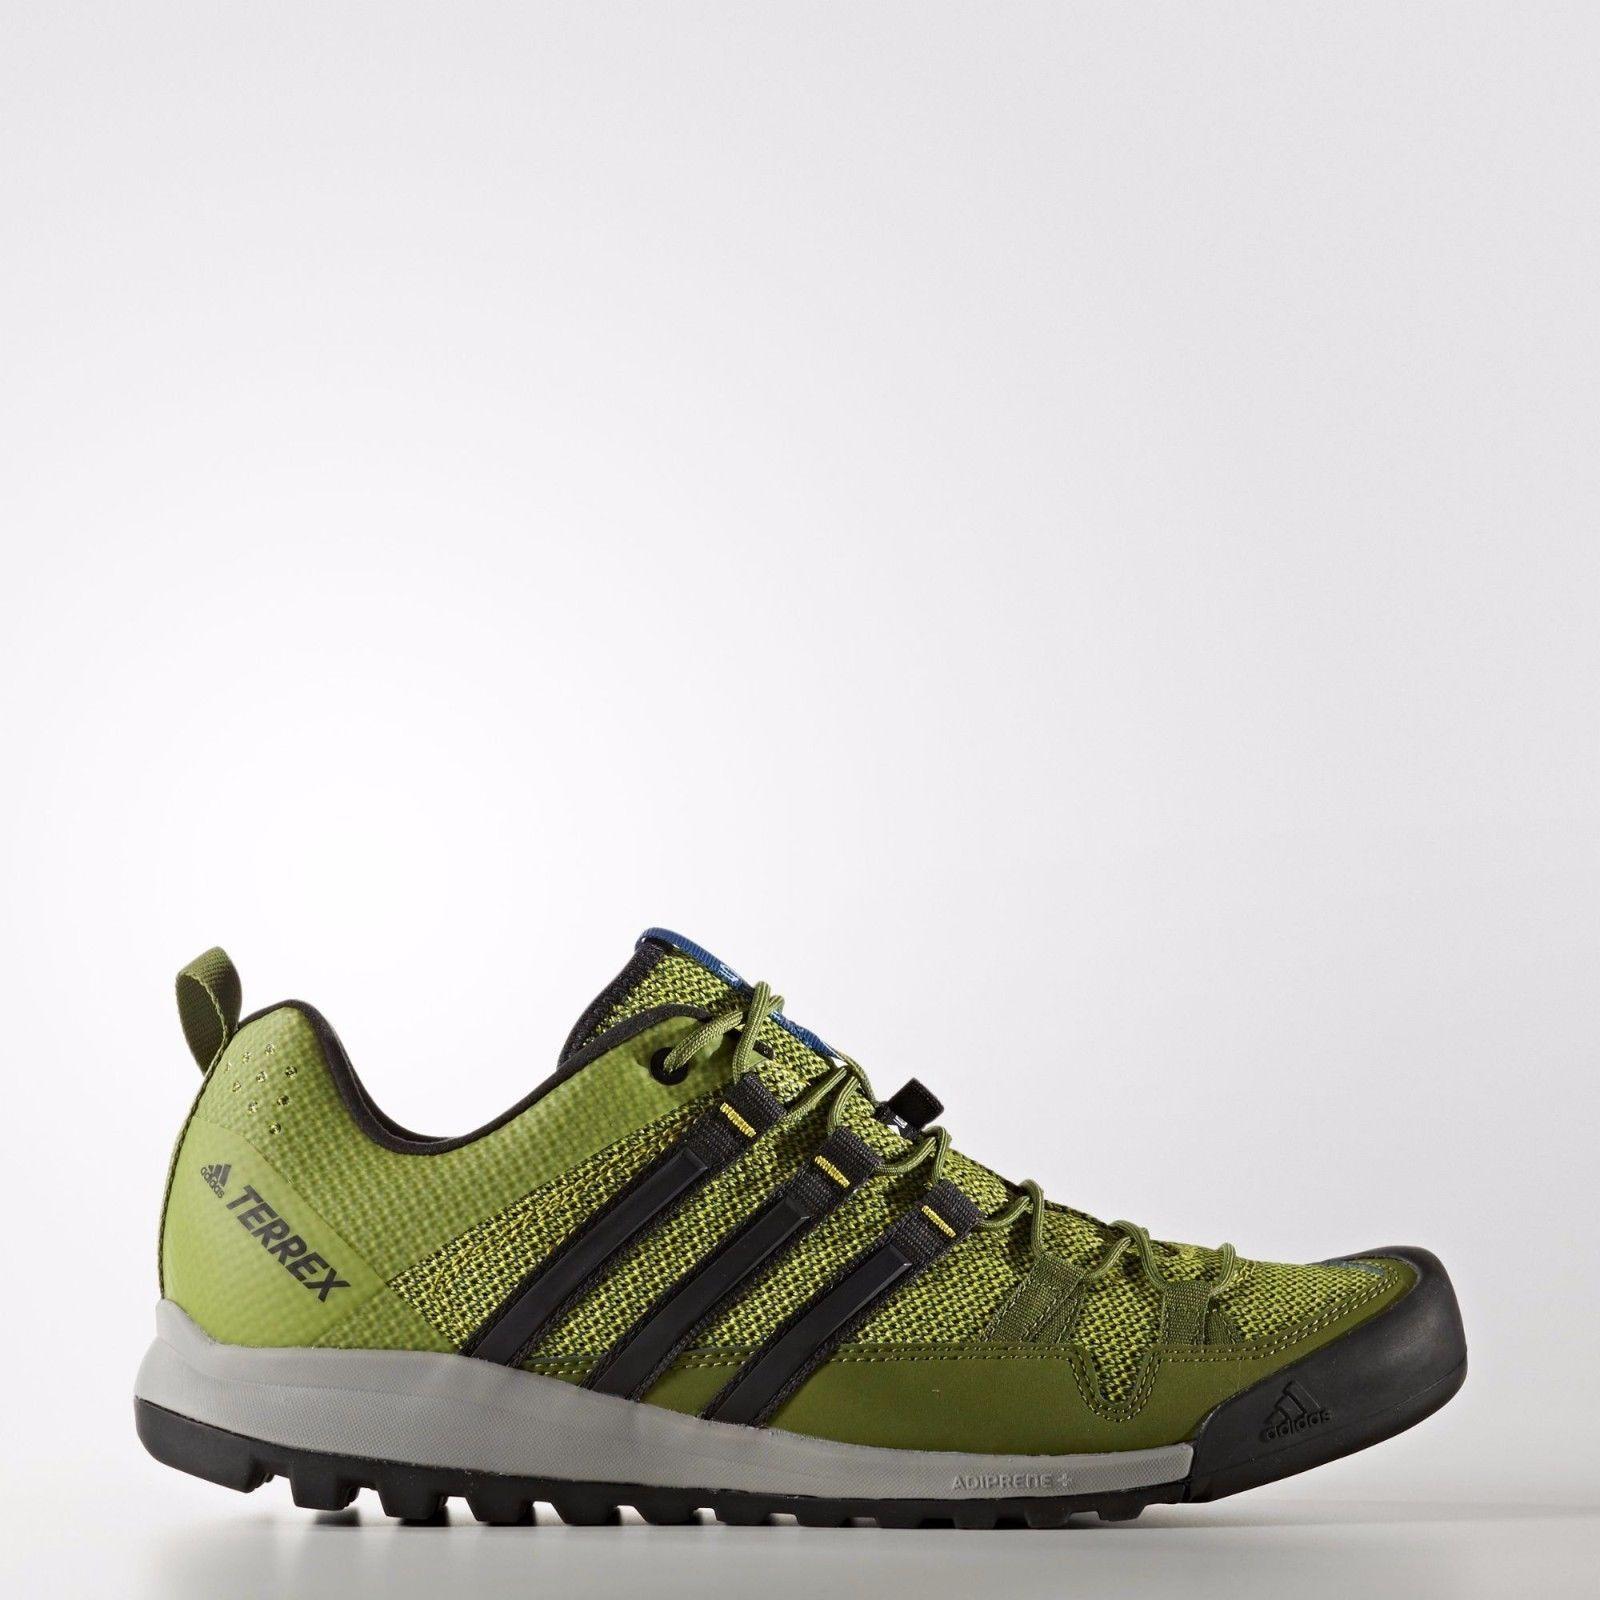 Adidas BB5563 Men's Outdoor Terrex Solo Shoes, Unity Lime